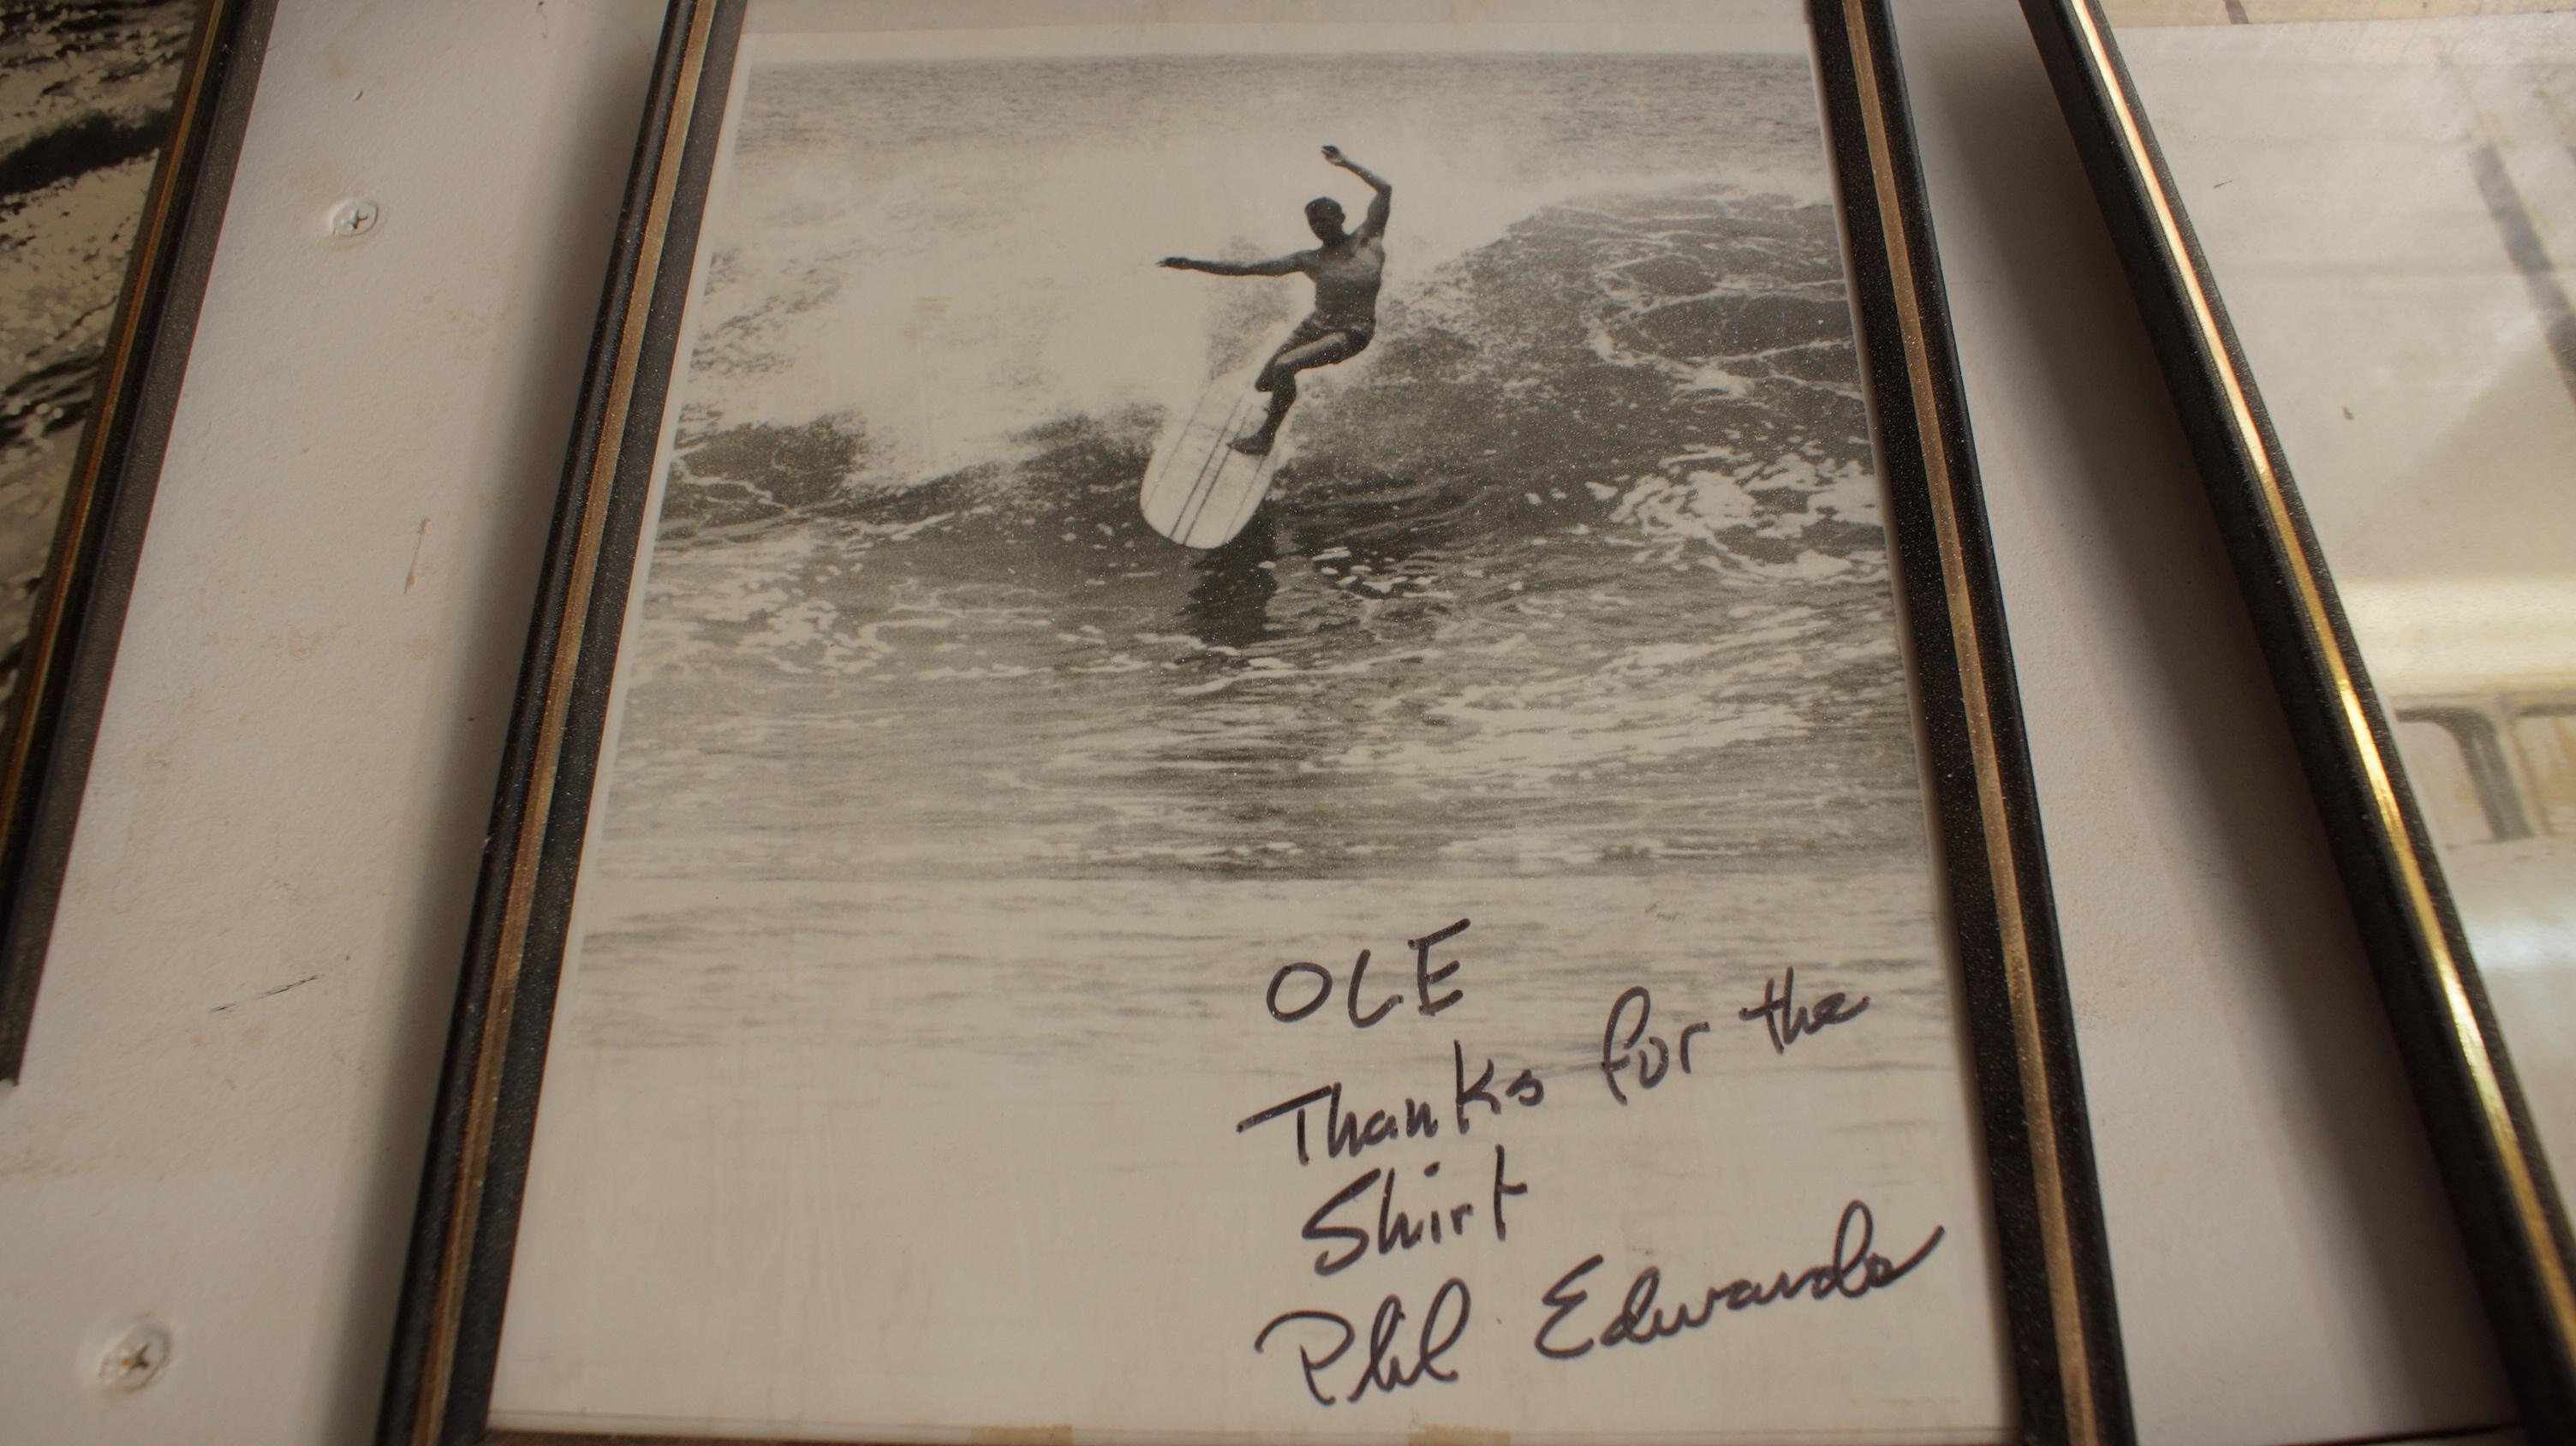 Phil Edwards for Bob Ole Olson